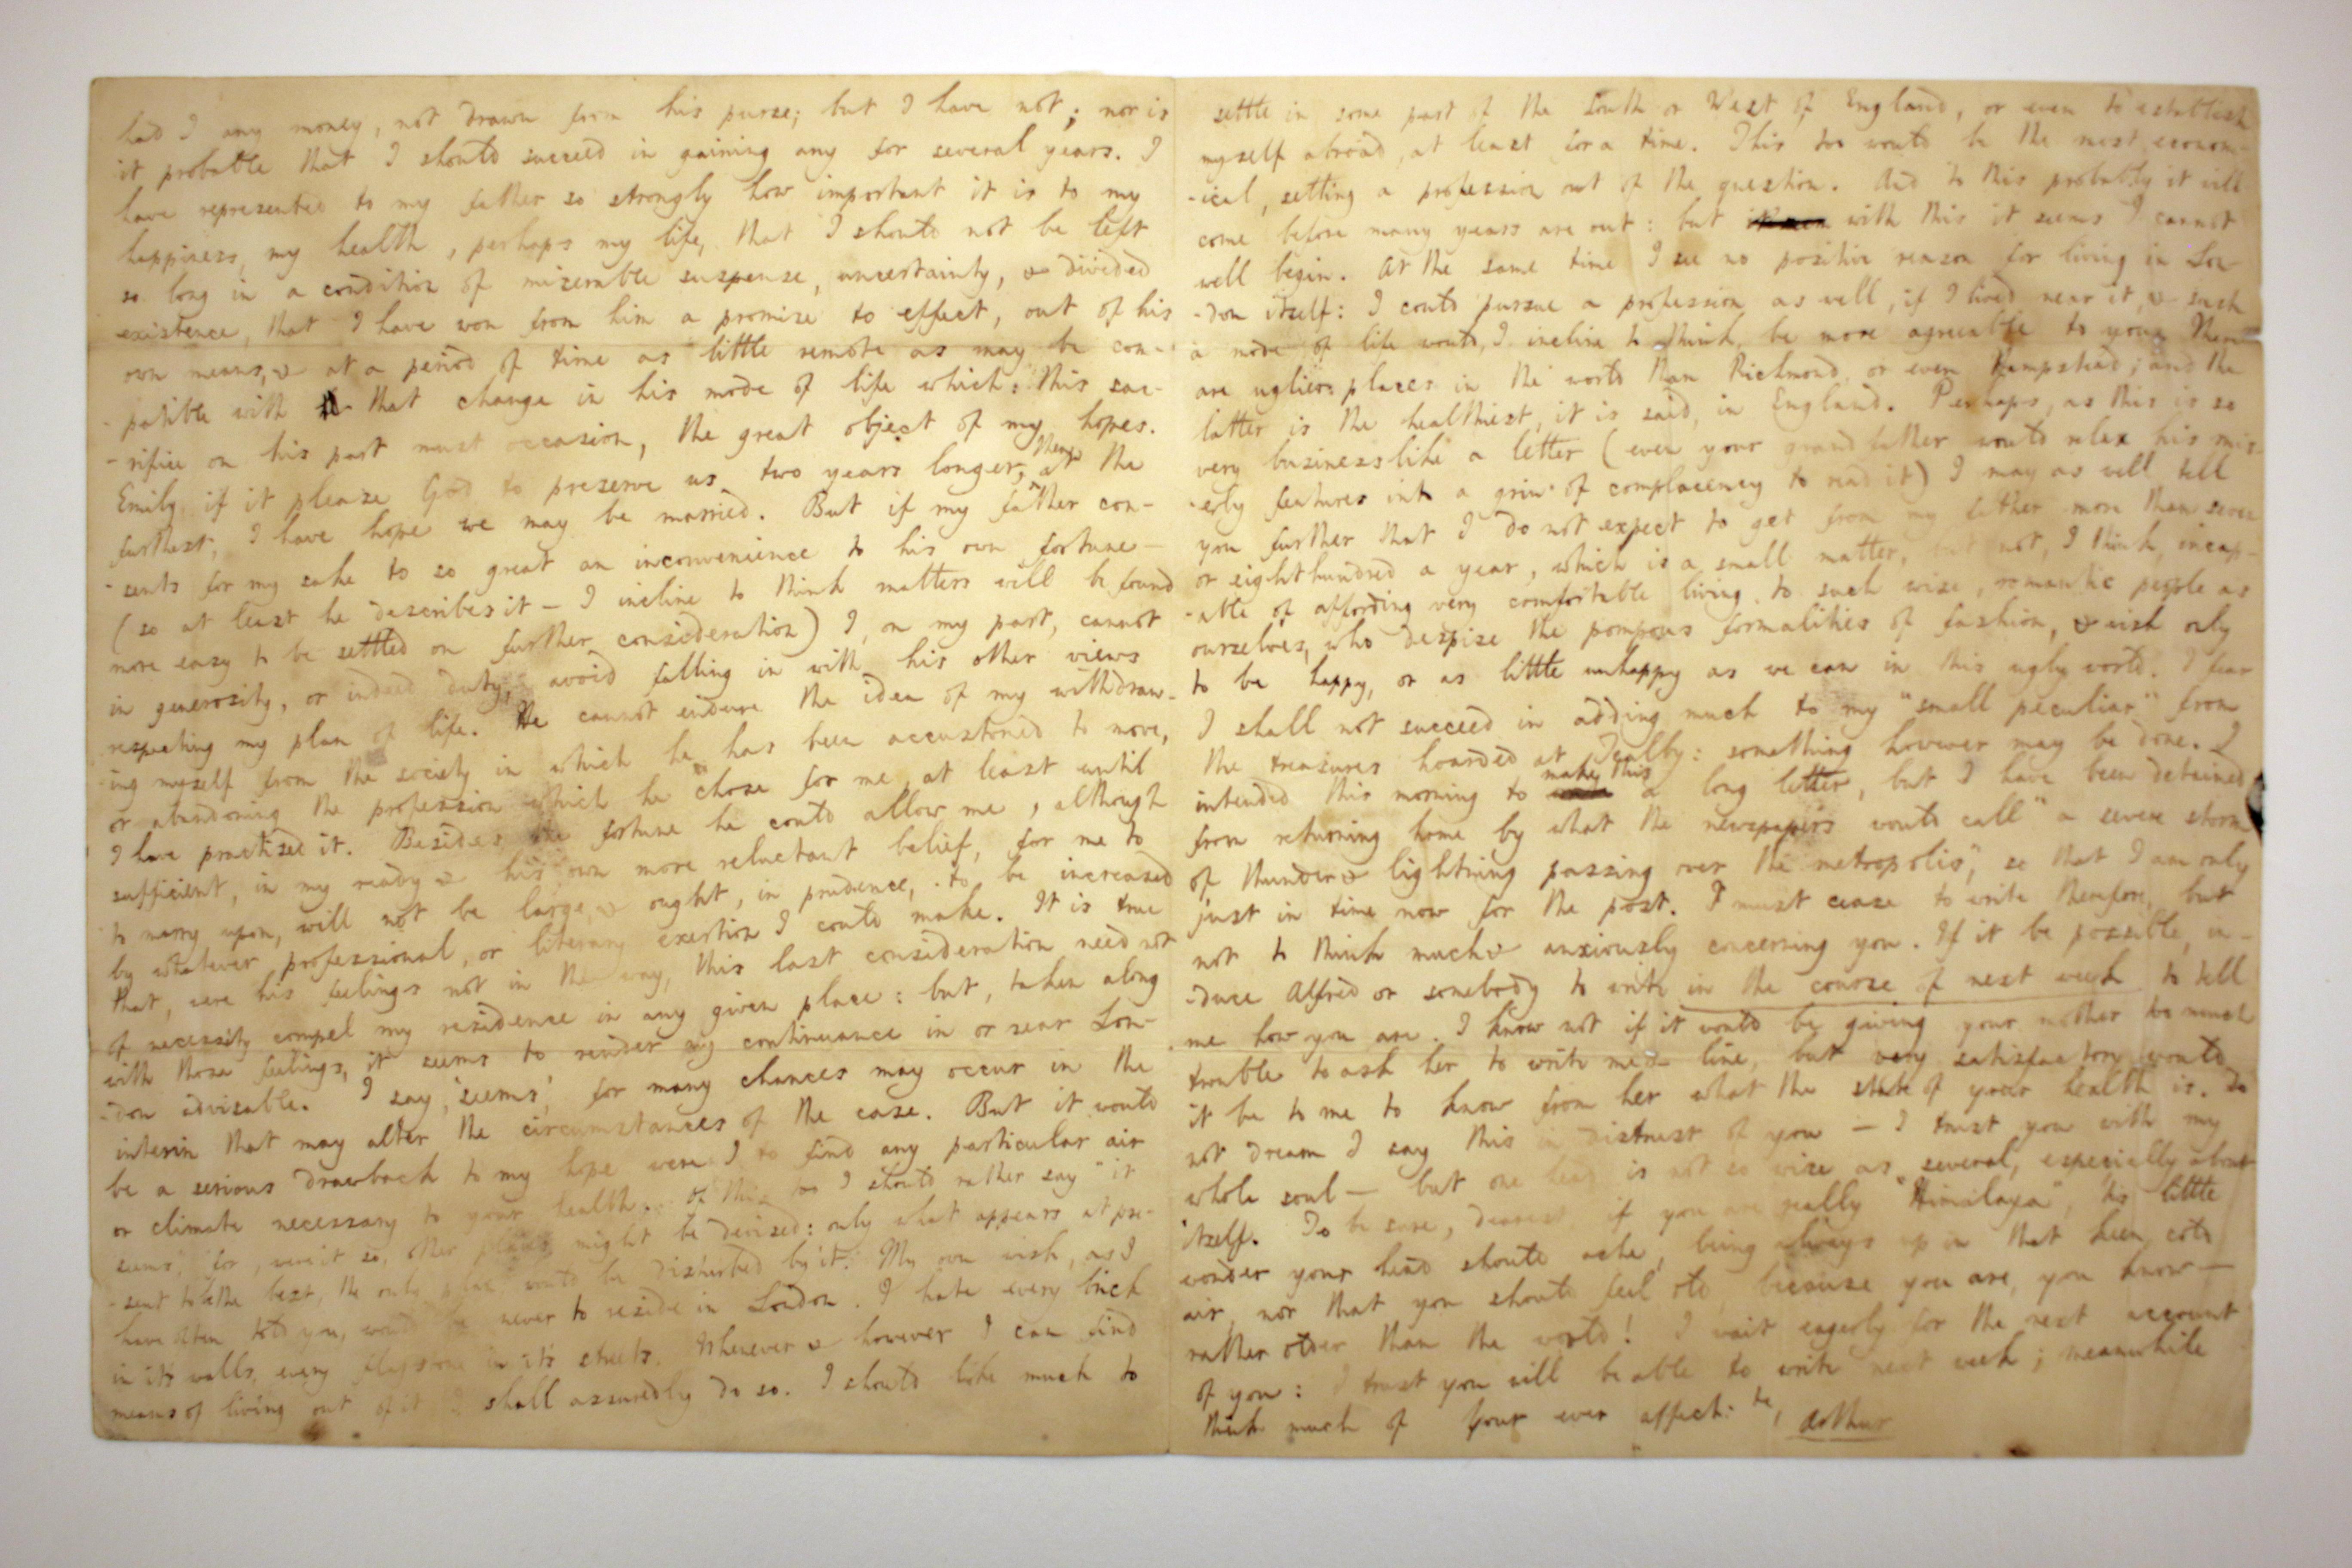 Hallam Letter, June 9, 1832, 2